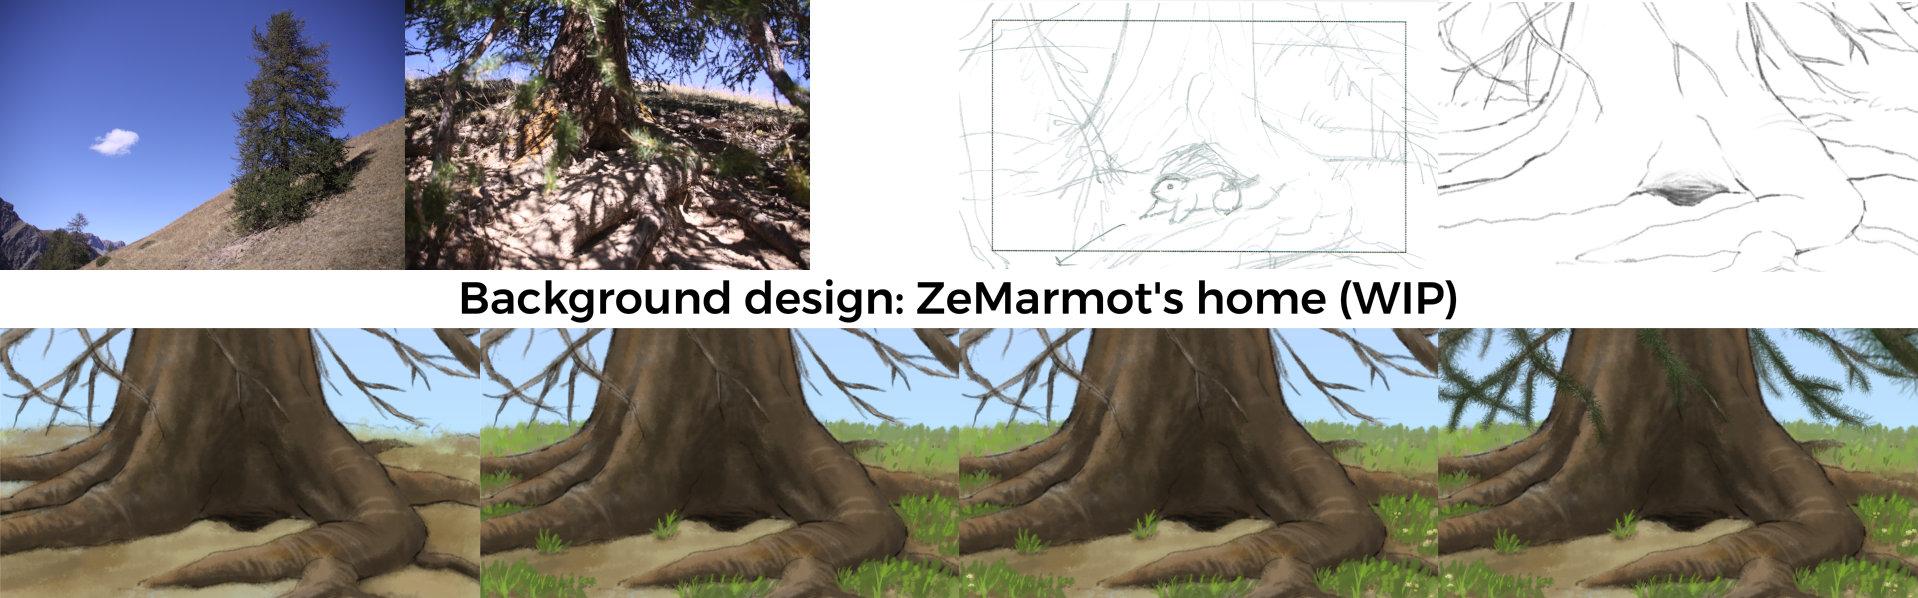 Background design: ZeMarmot home (title)